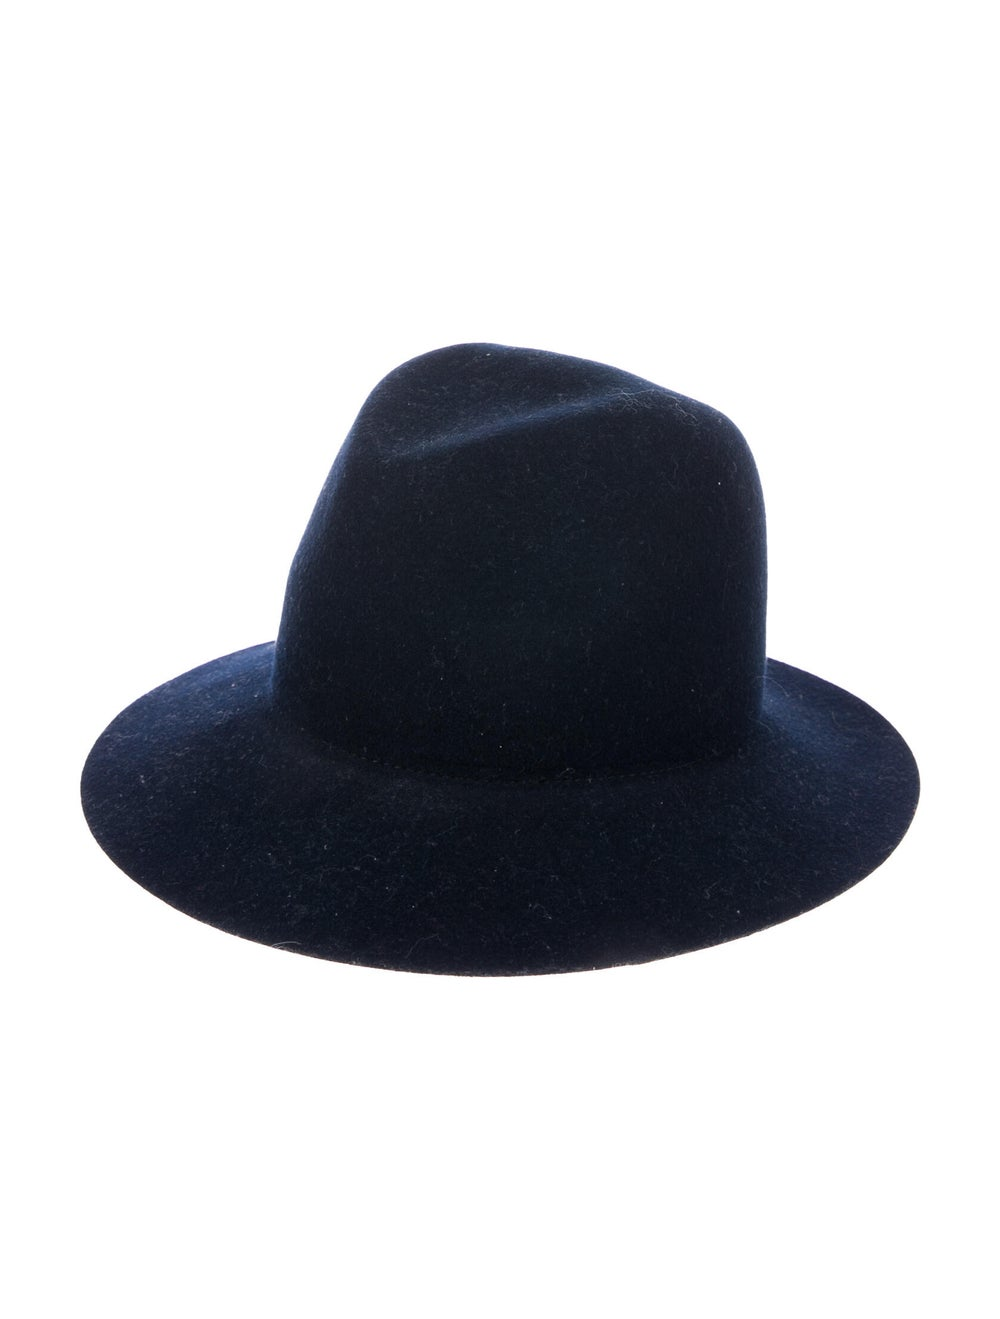 Janessa Leone Felt Fedora Hat Navy - image 1